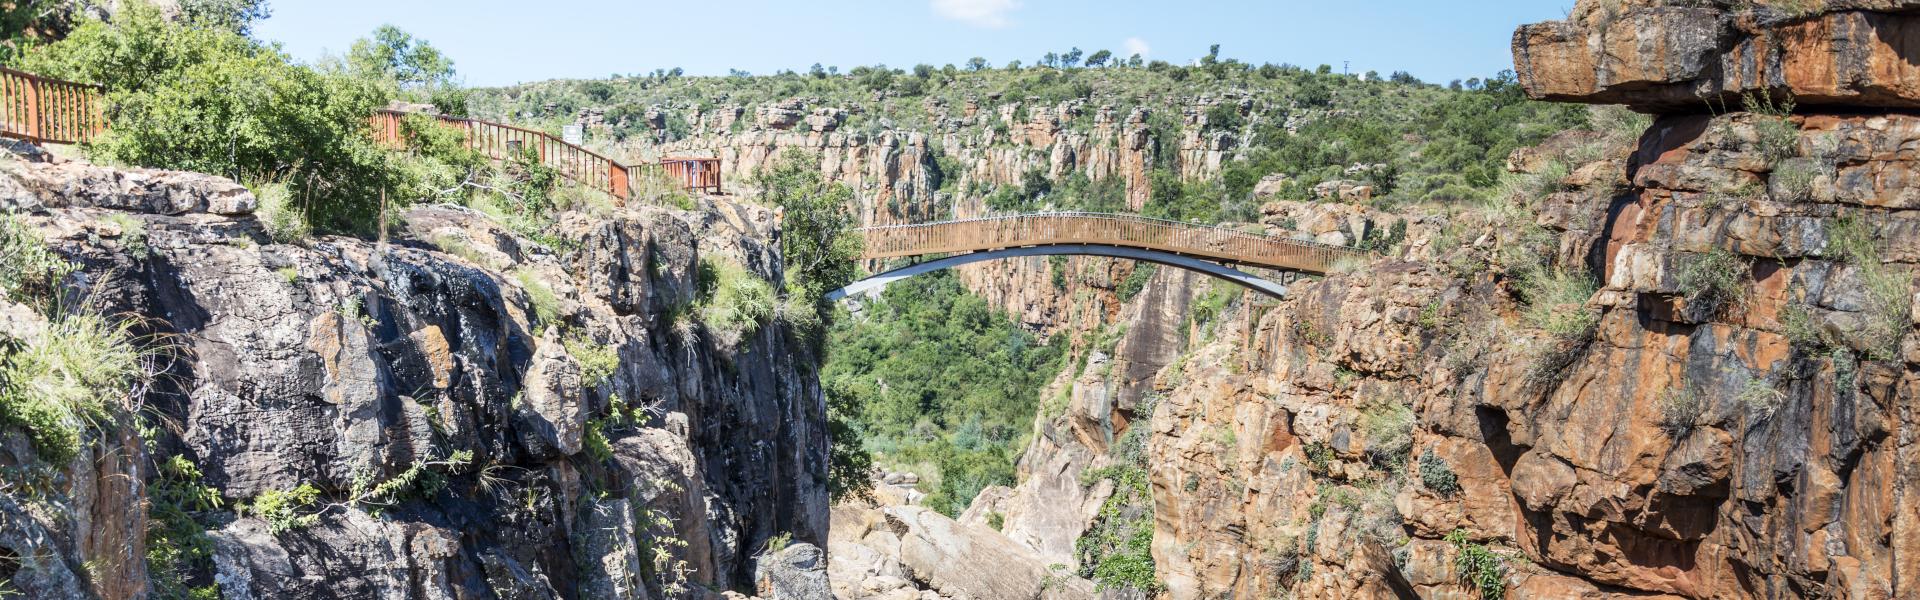 Südafrika & Swaziland - Big Five & Beach komfort